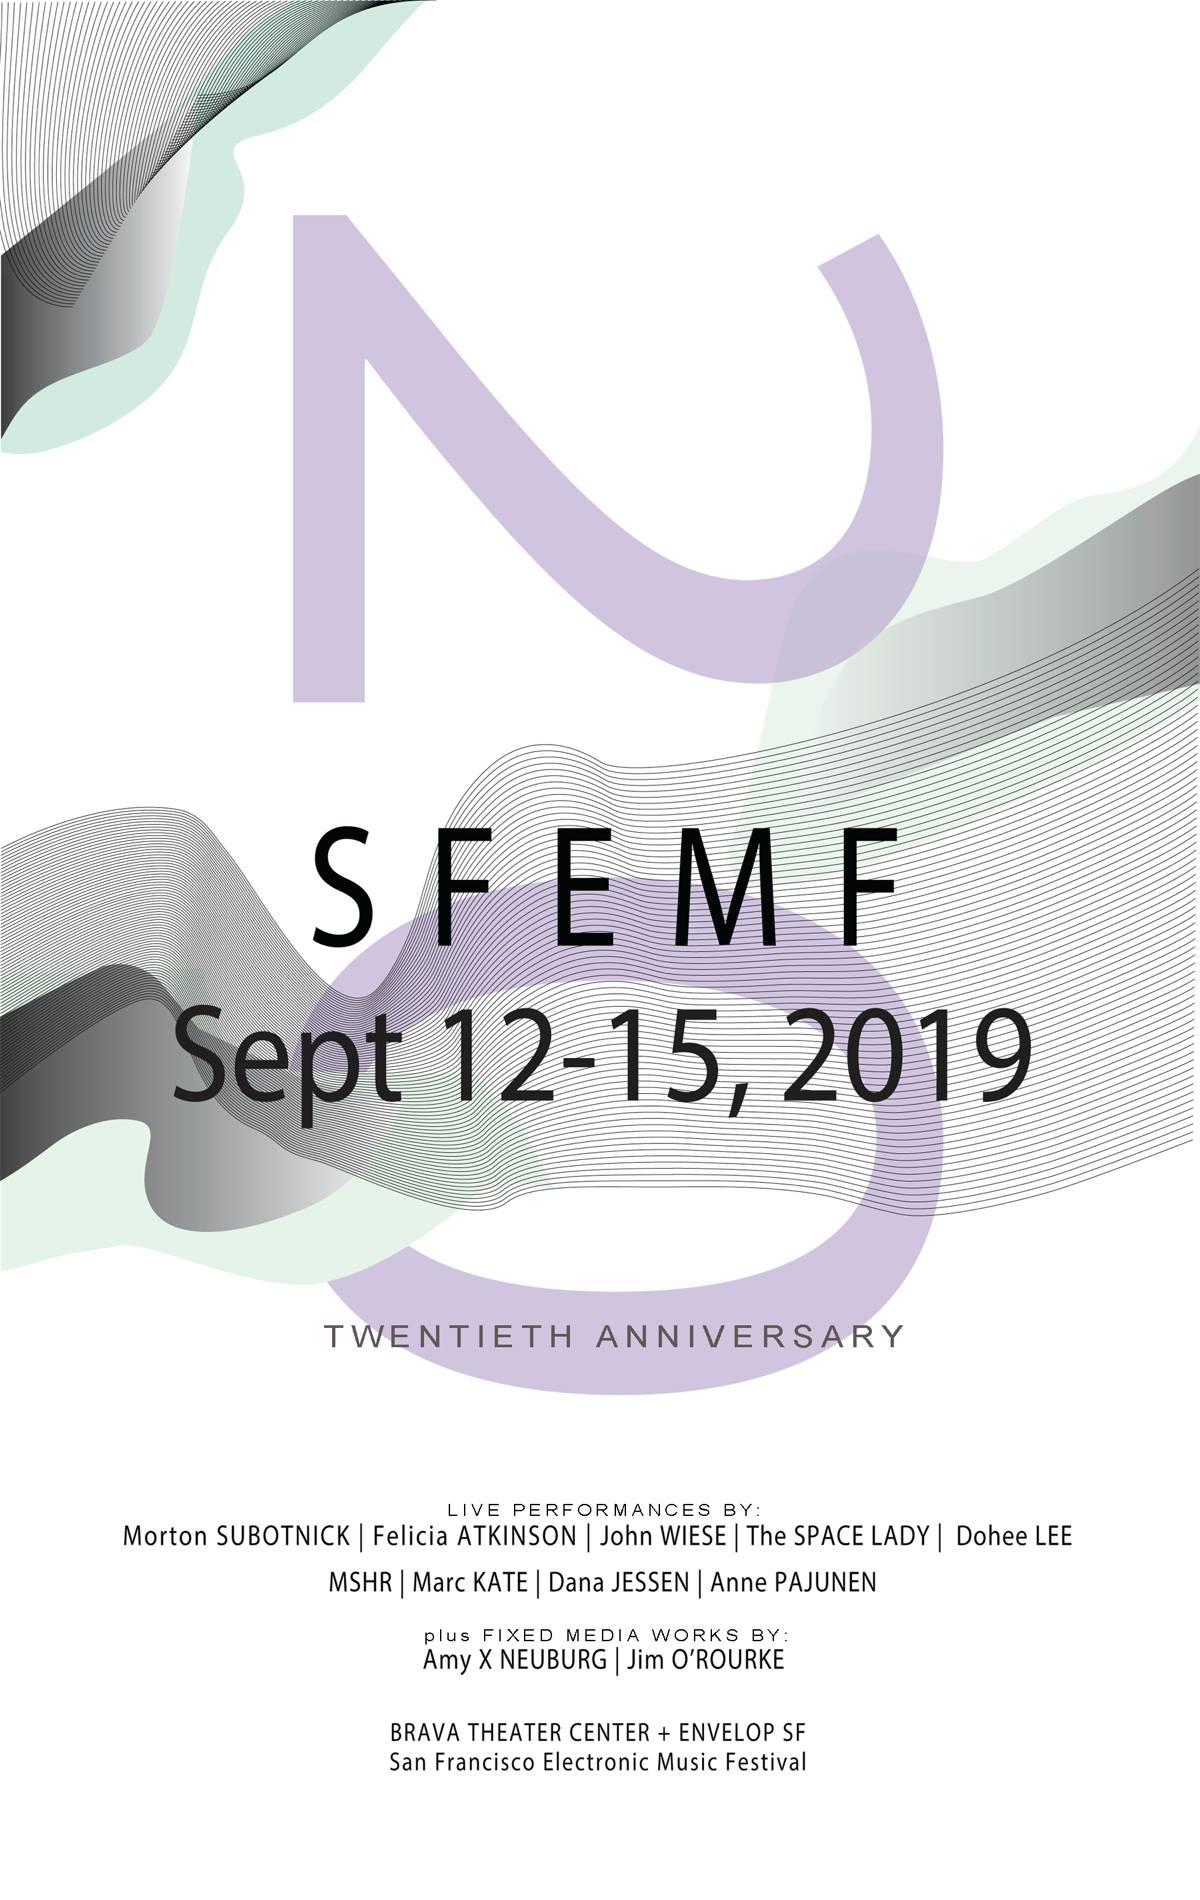 San Francisco Electronic Music Festival 20th Anniversary